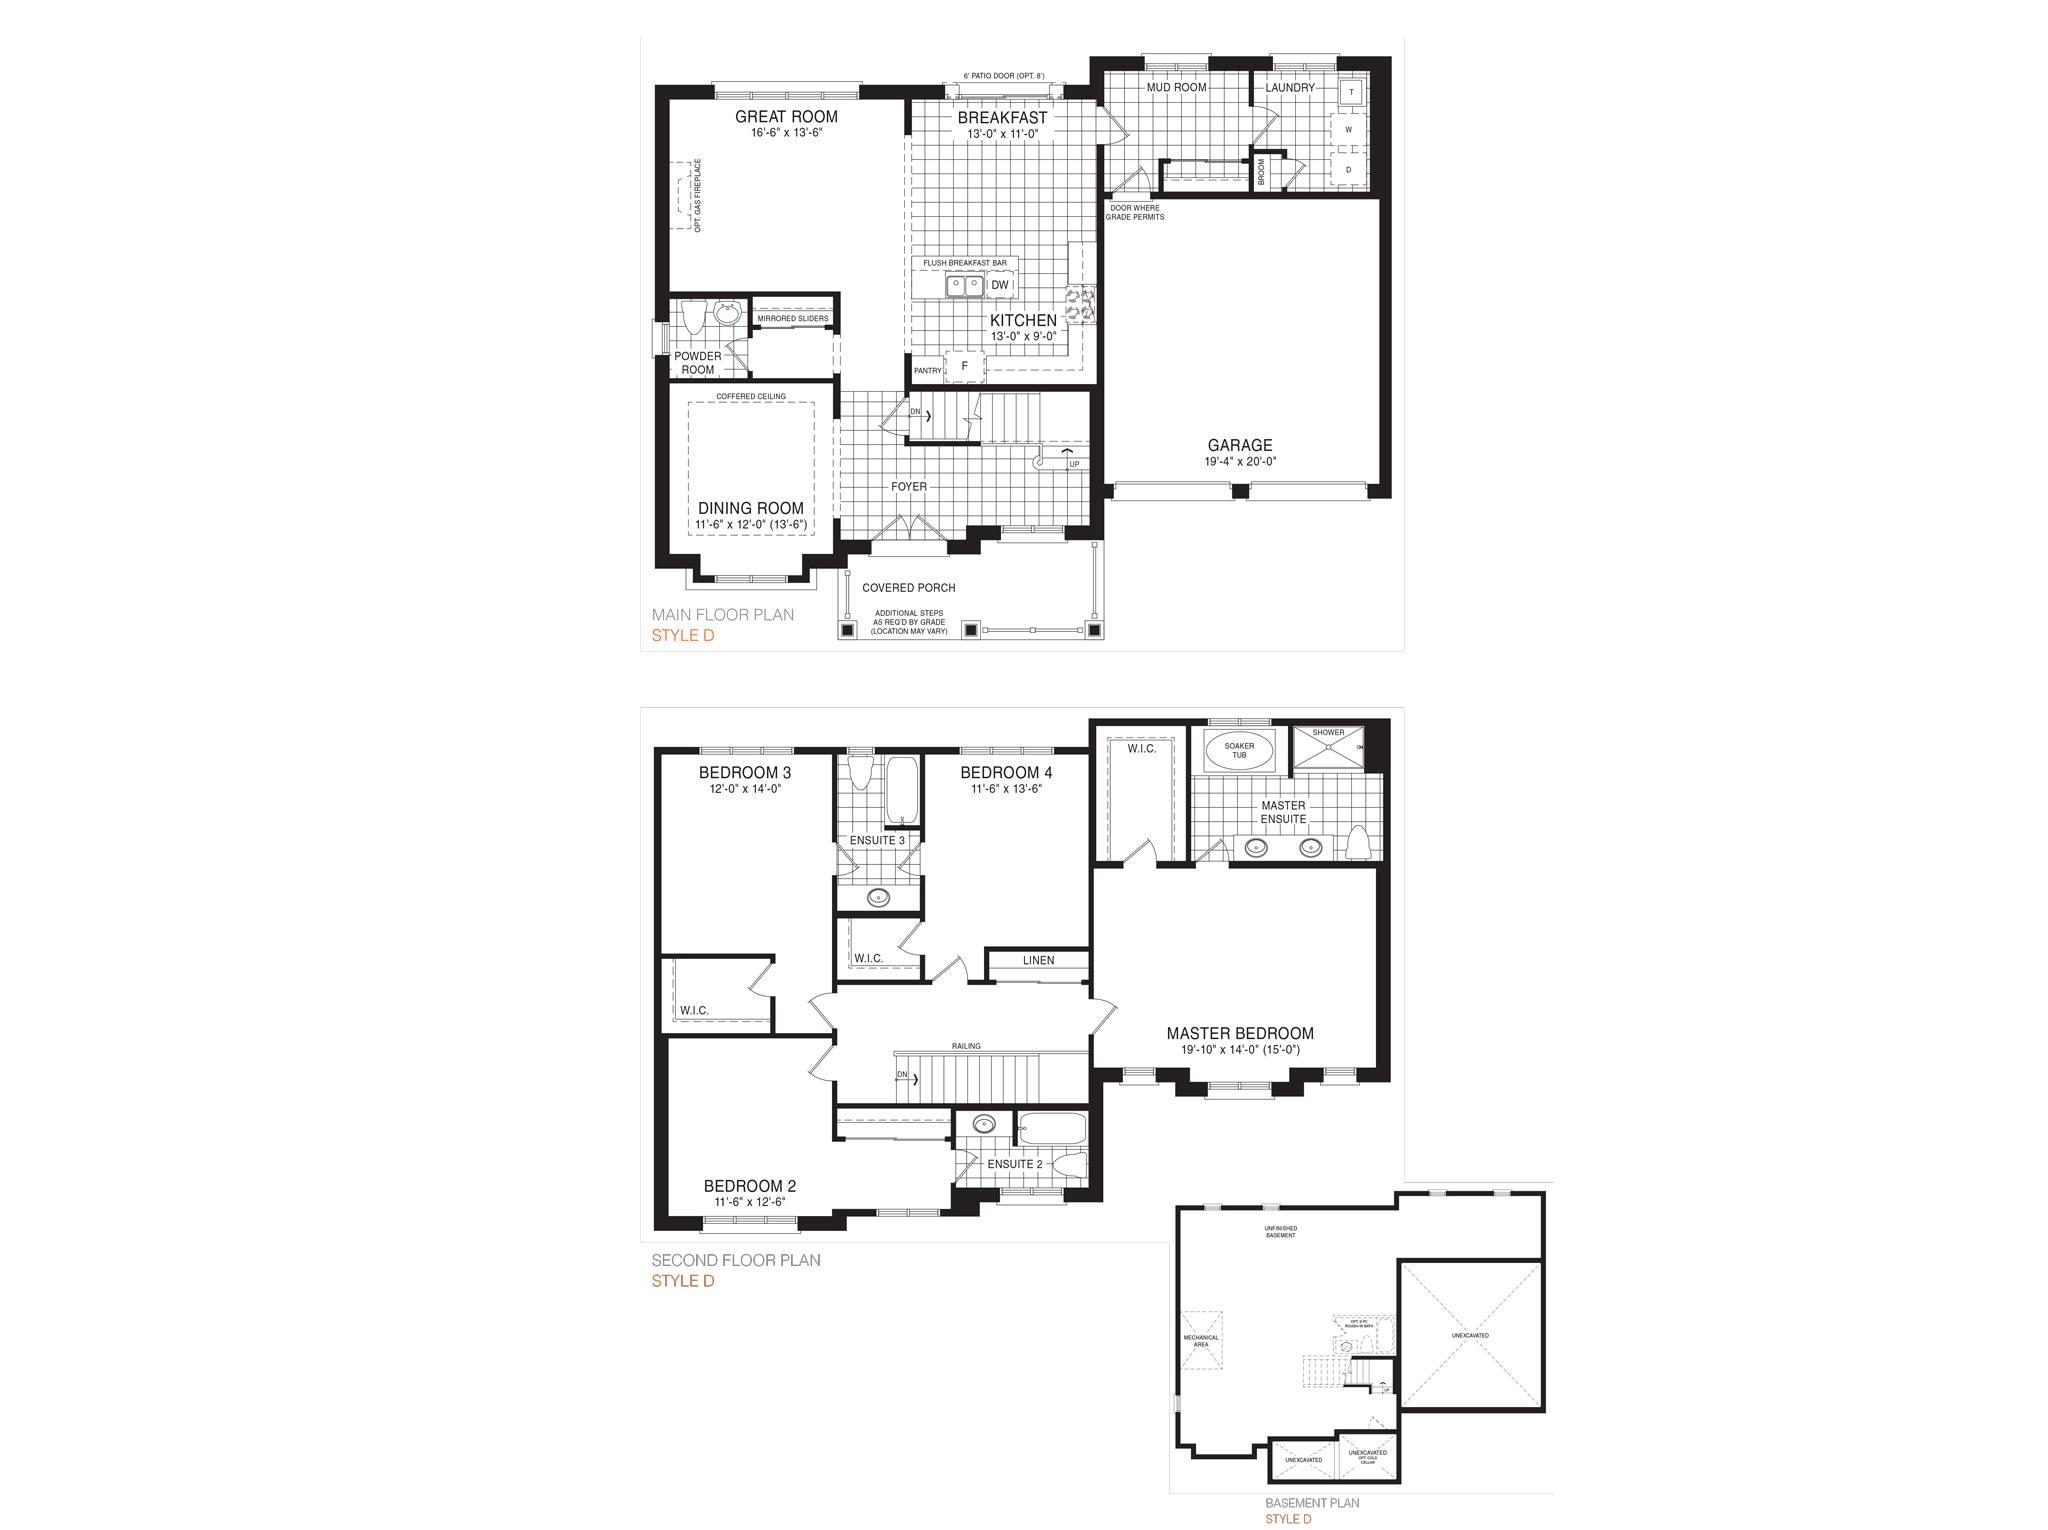 35941-lush-brandon-floor-plan